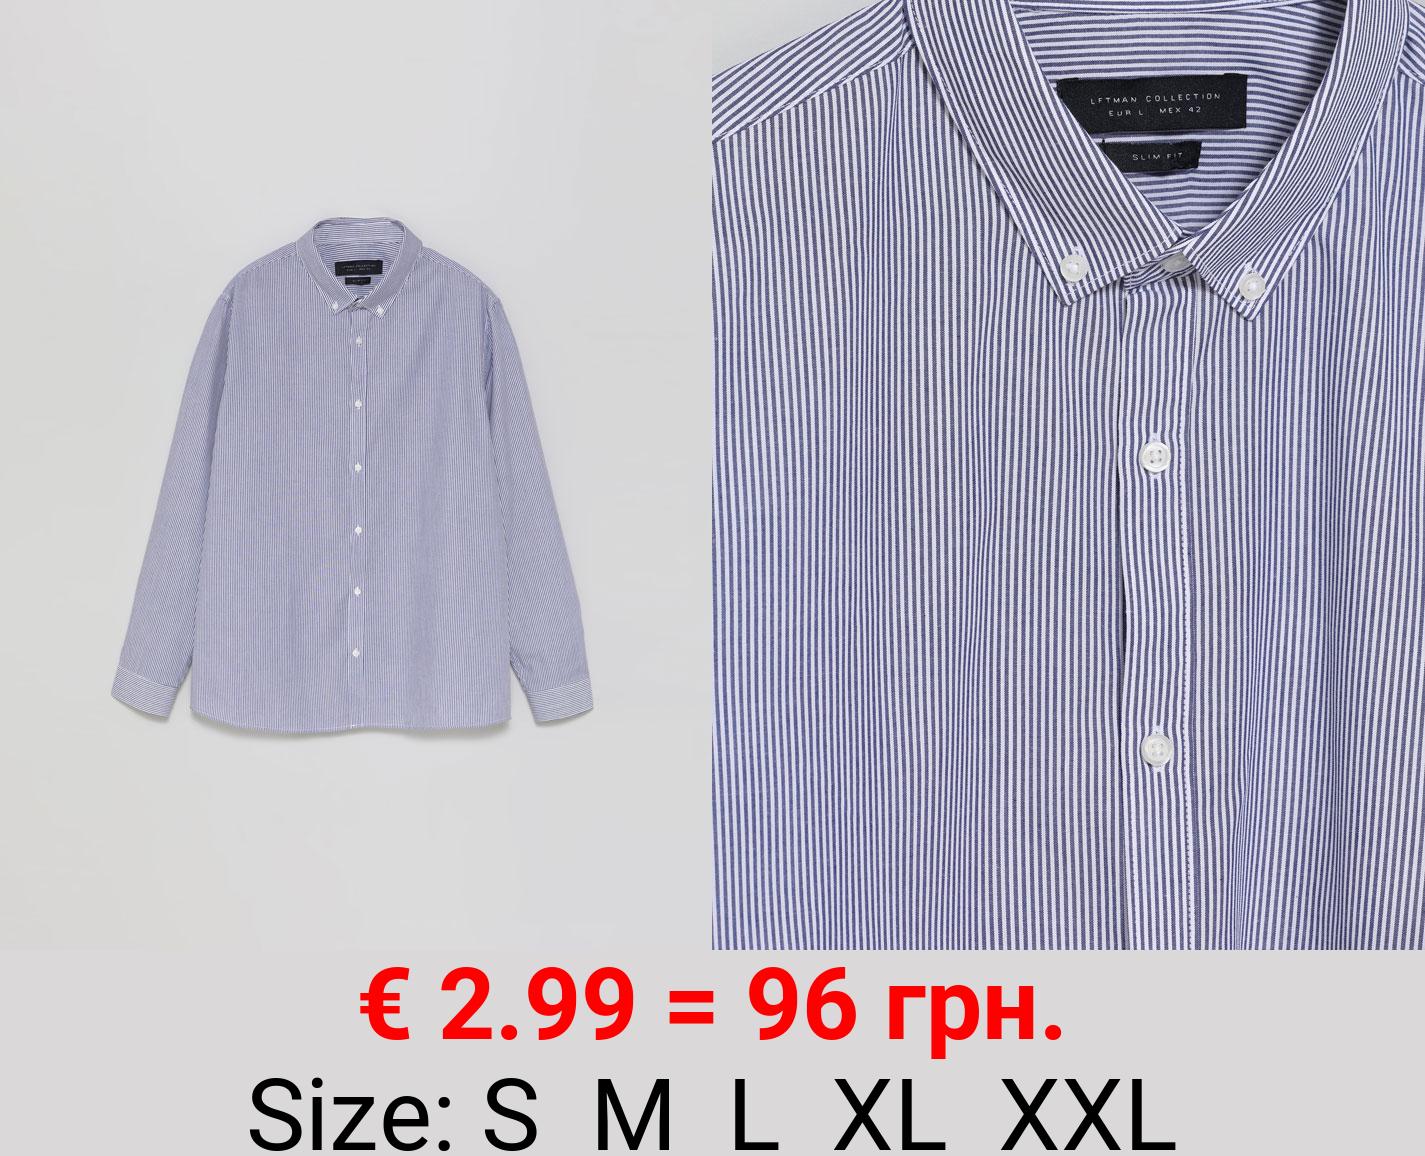 Easy-Iron Striped Shirt